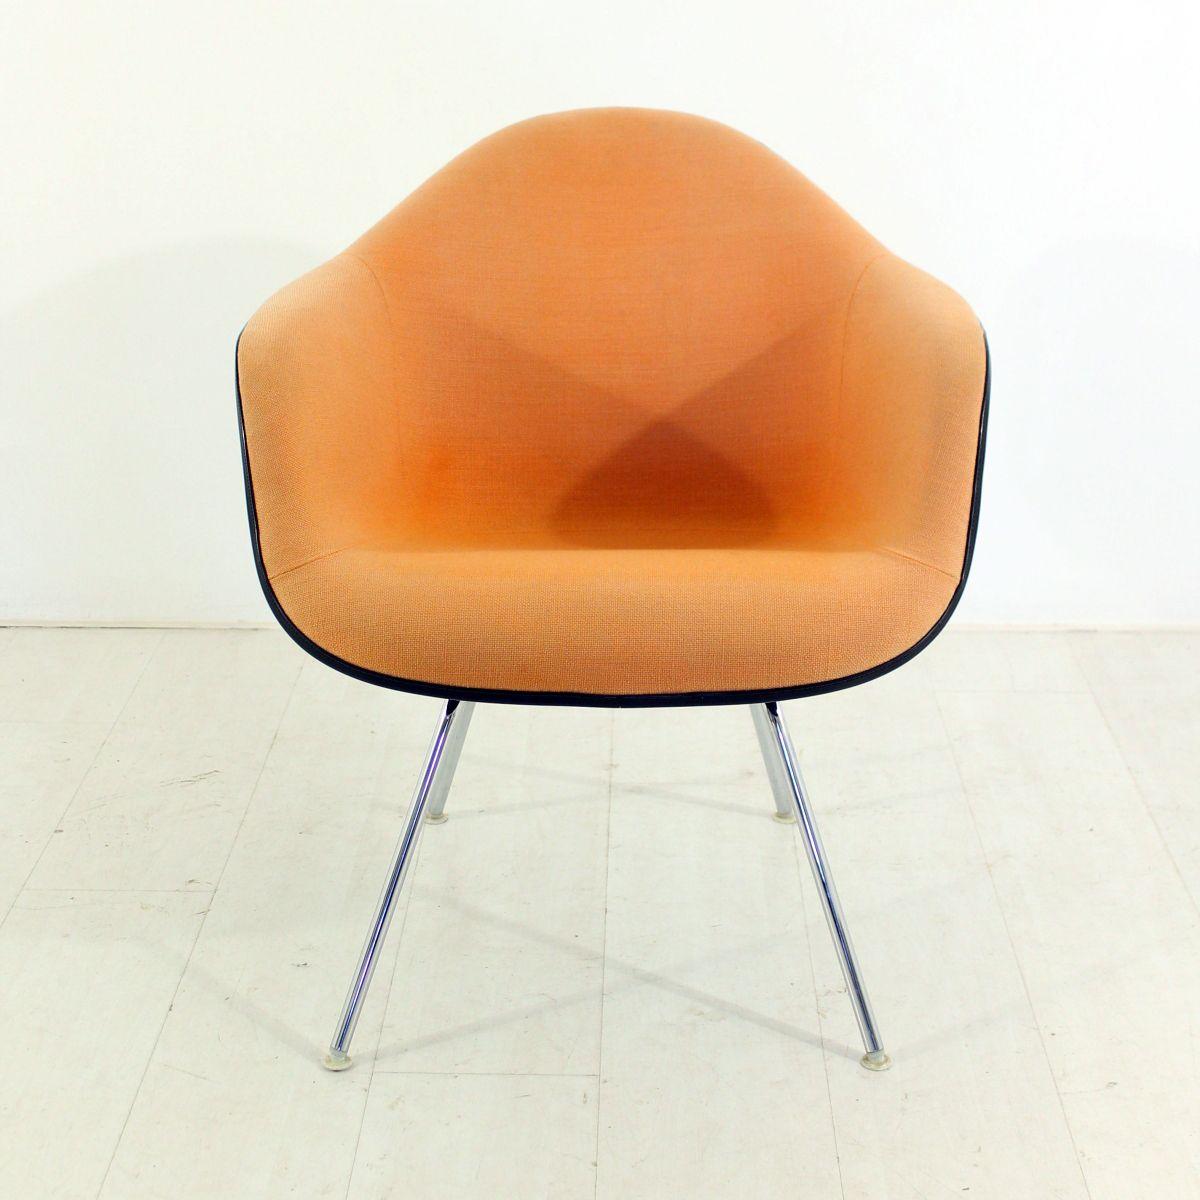 vintage sessel in terracotta von charles ray eames for. Black Bedroom Furniture Sets. Home Design Ideas